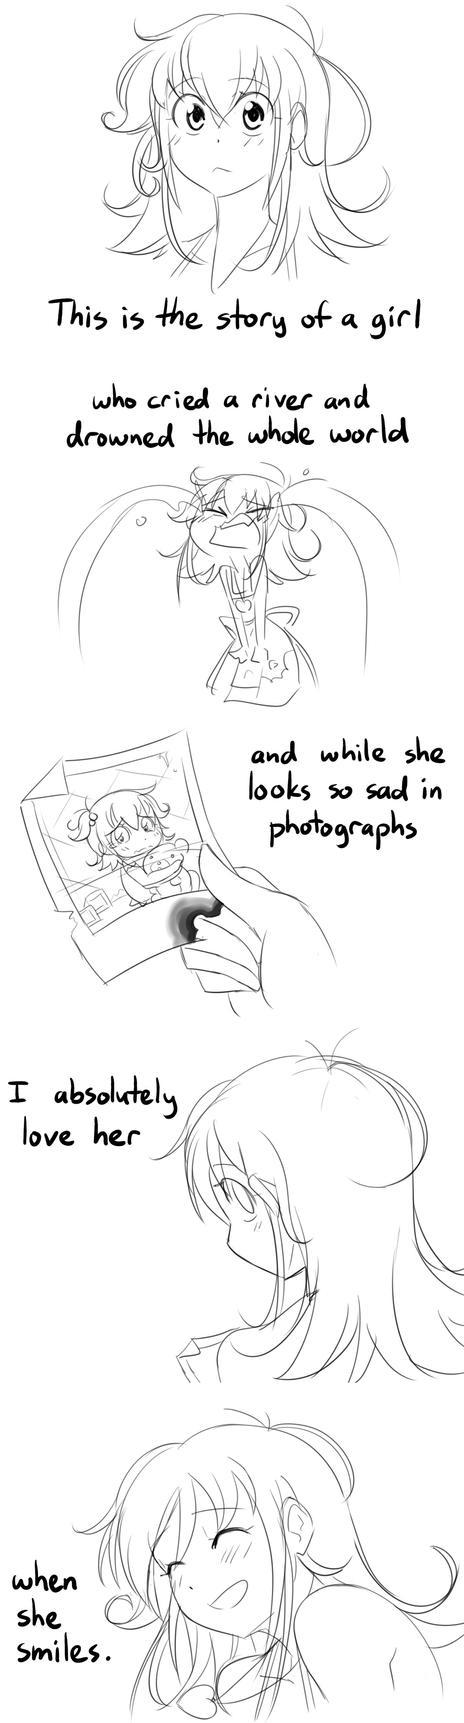 Her pretty face she hid from the world by Matsu-sensei